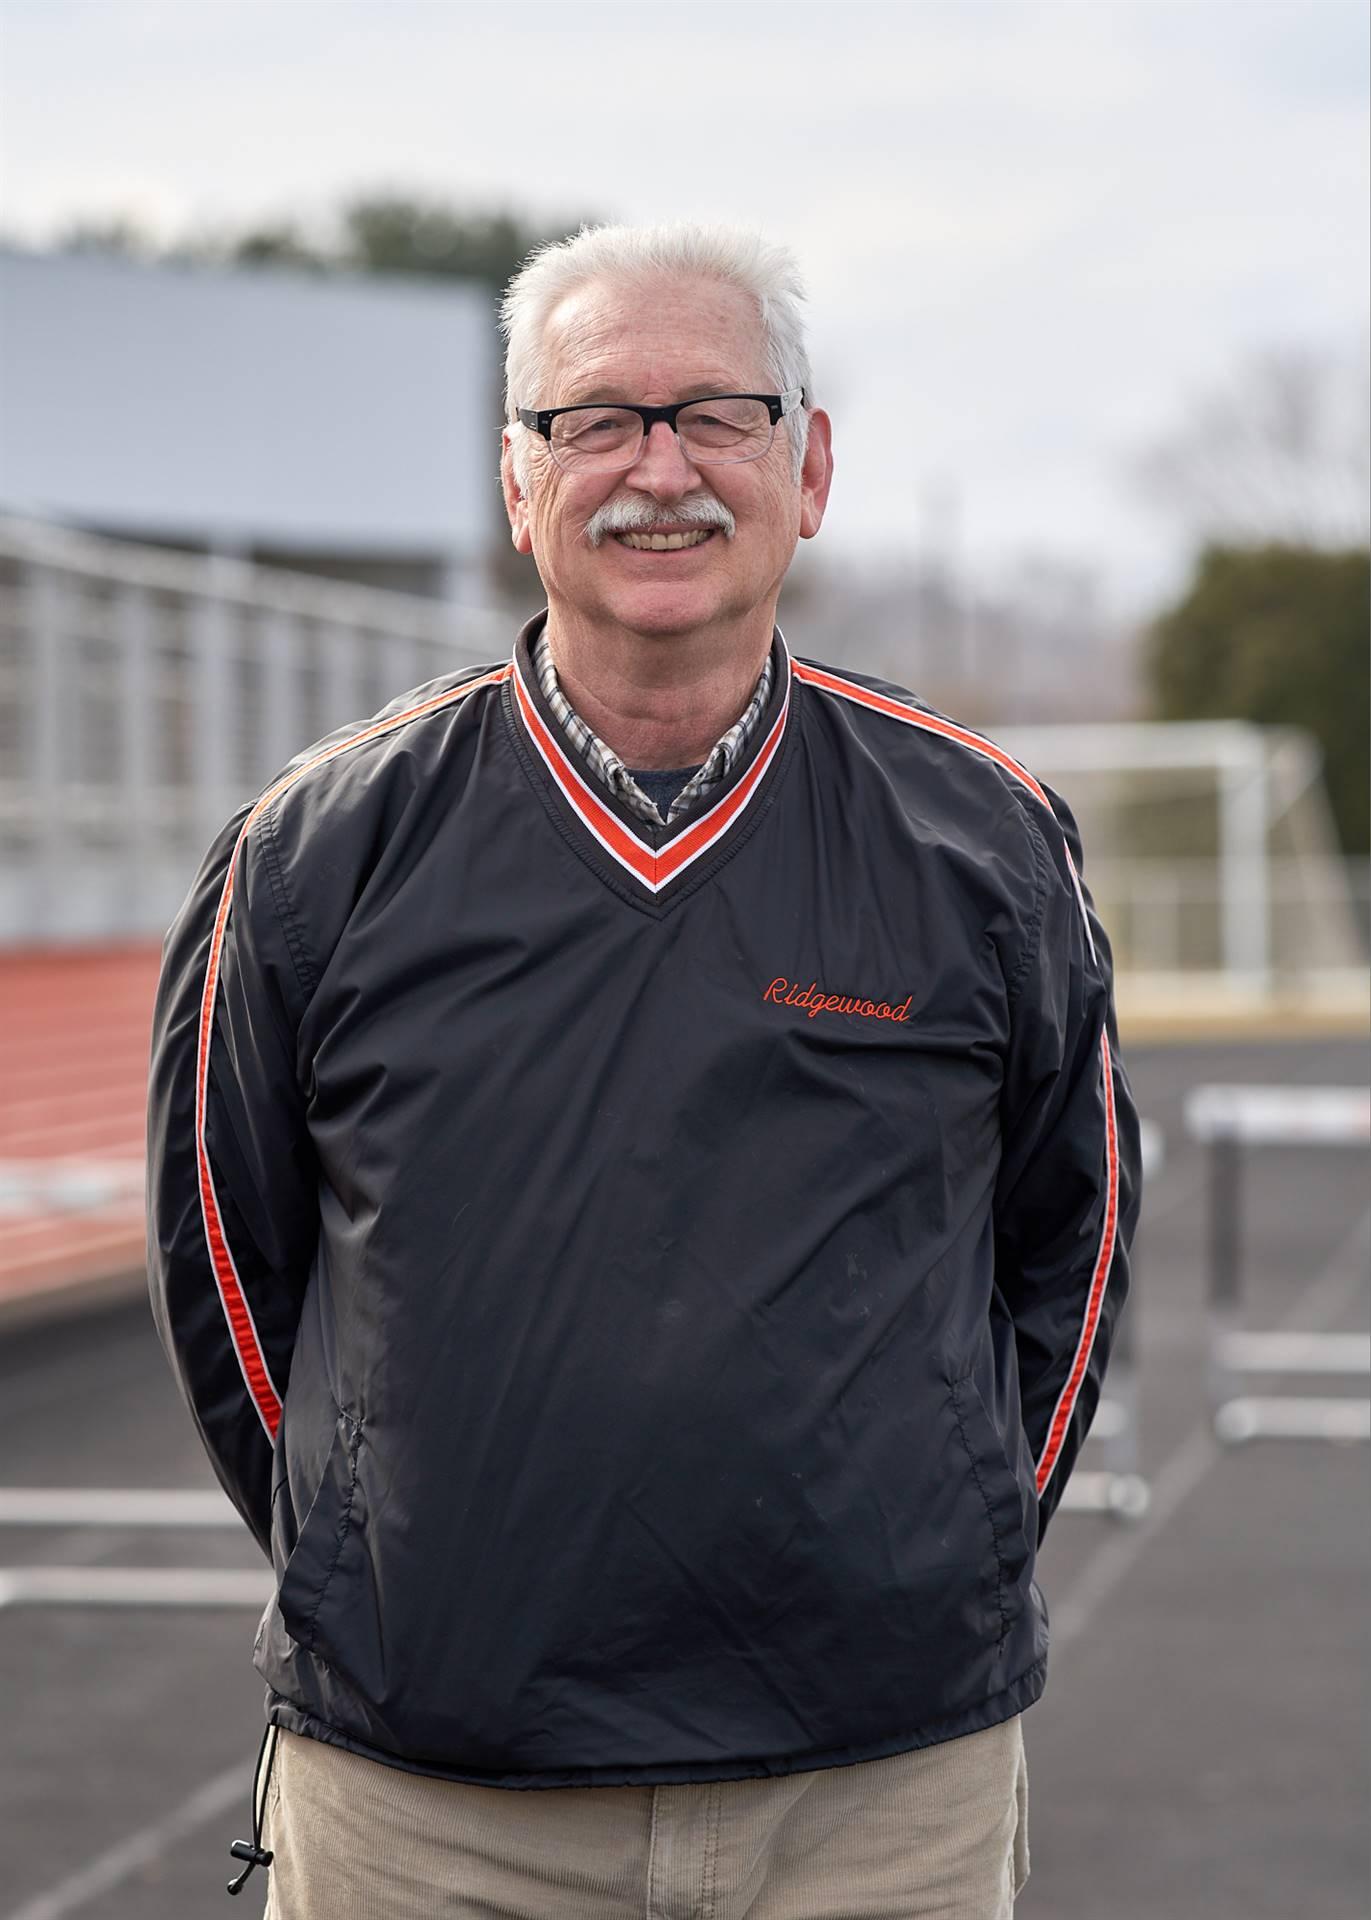 2019 girls track coach